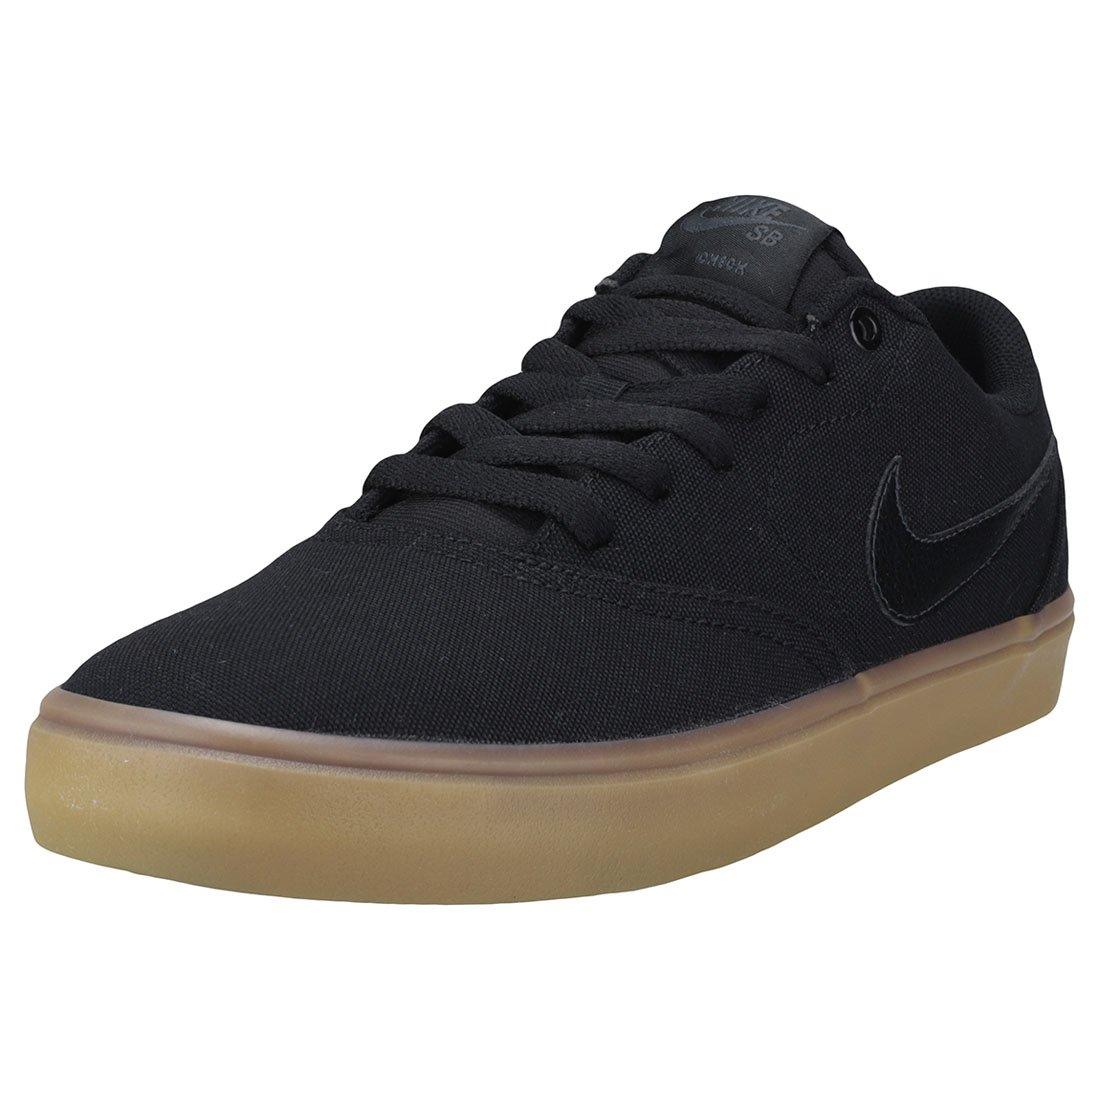 Nike Men's SB Check Solarsoft Canvas Skateboarding Shoes Black/Black-Gum Light Brown 10